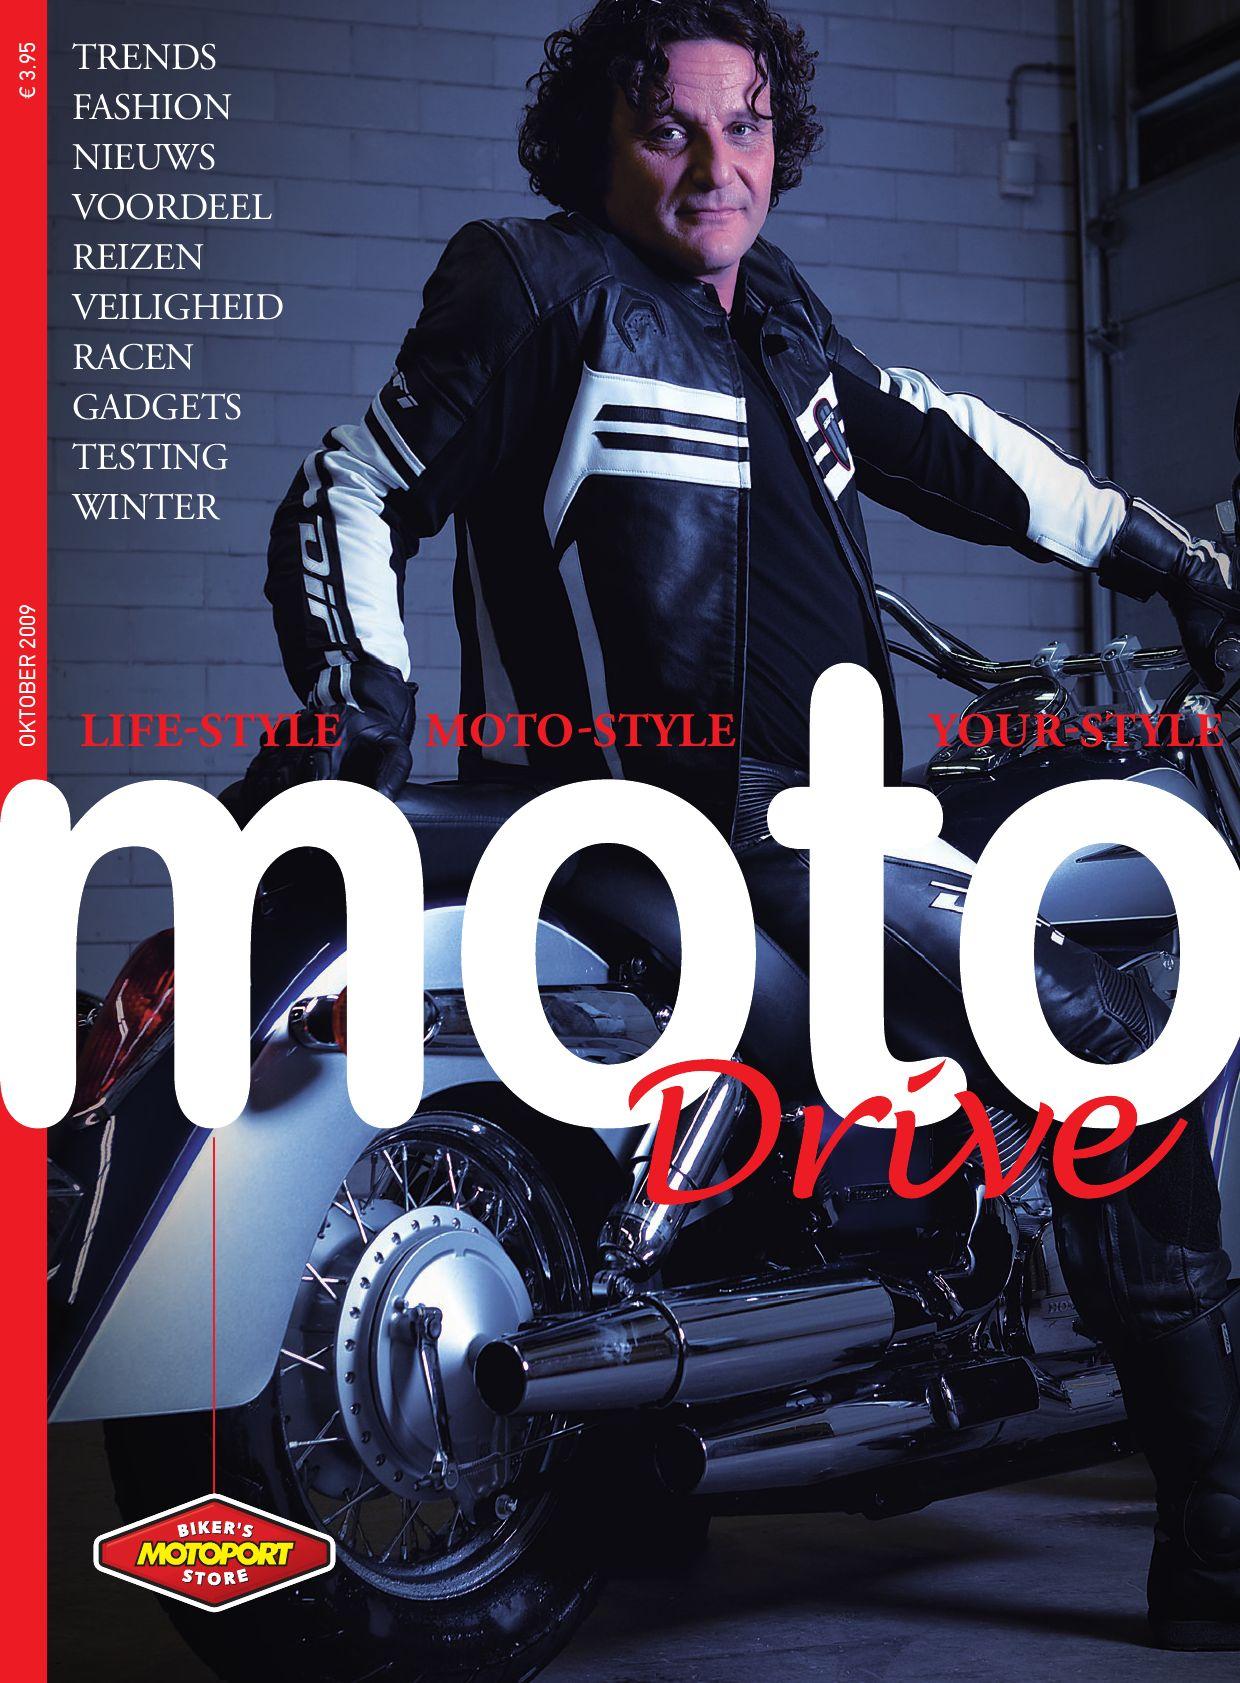 motodrive 3 by xtra digital agency